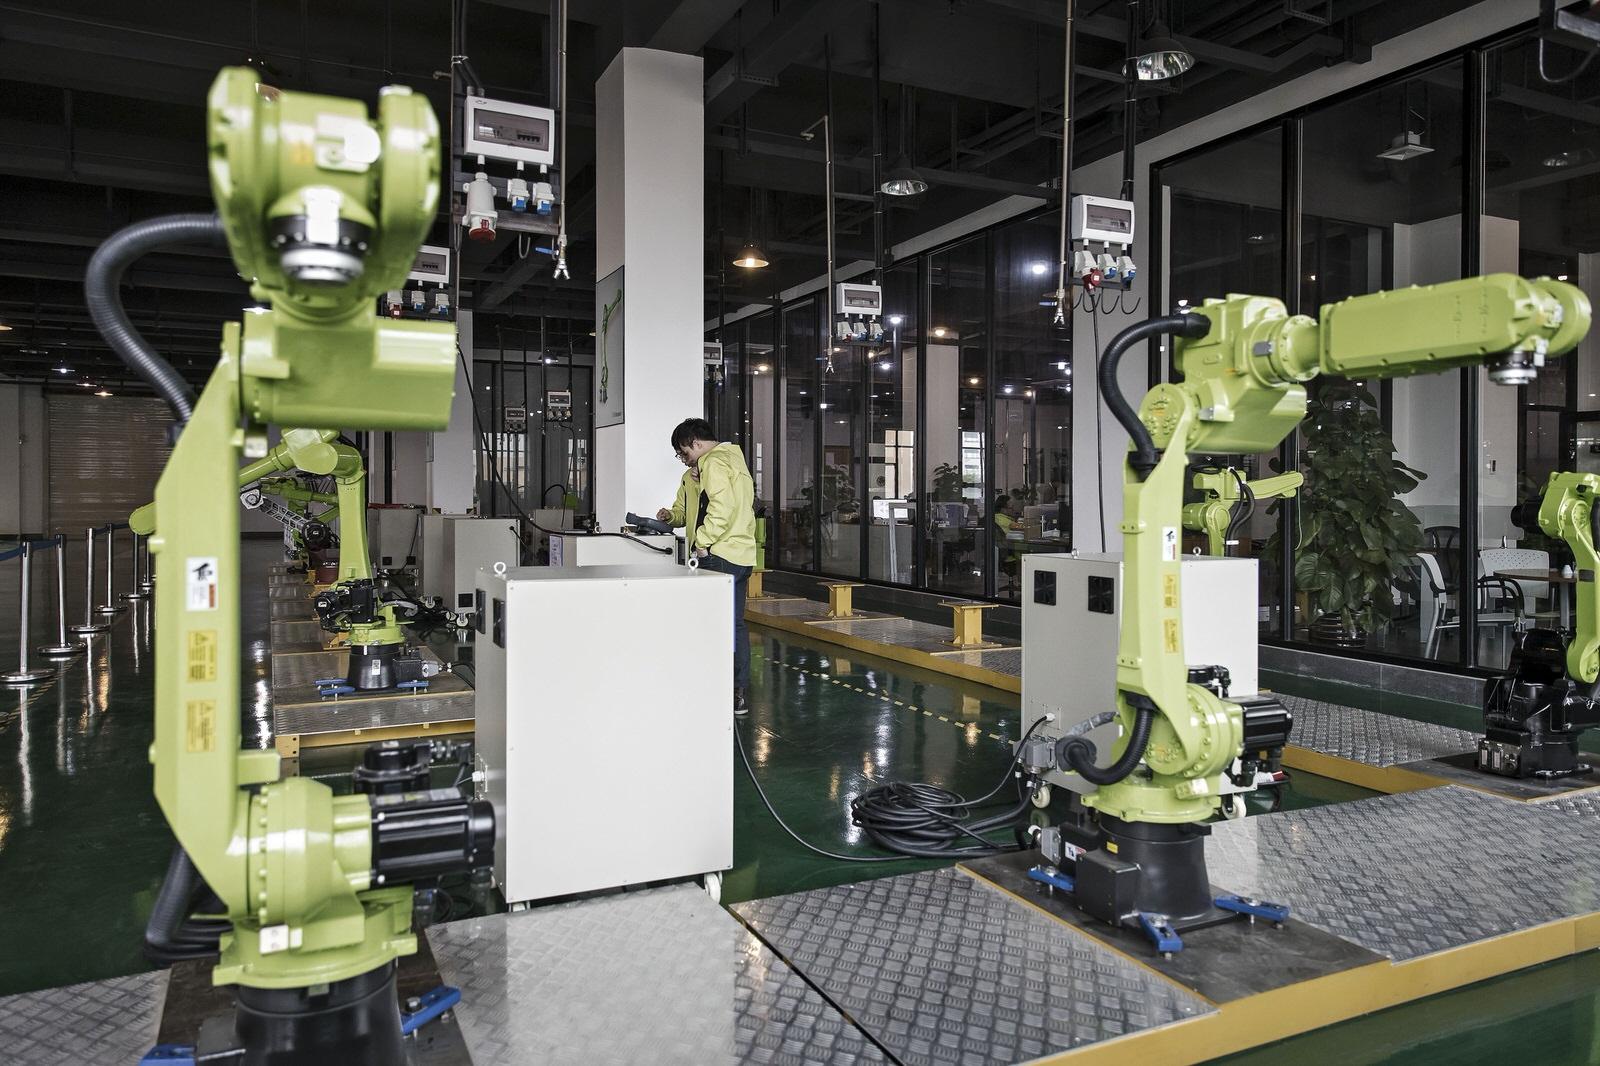 Chinas robots push to drive new era of trade productivity chinas robots push to drive new era of trade productivity bloomberg professional services malvernweather Images